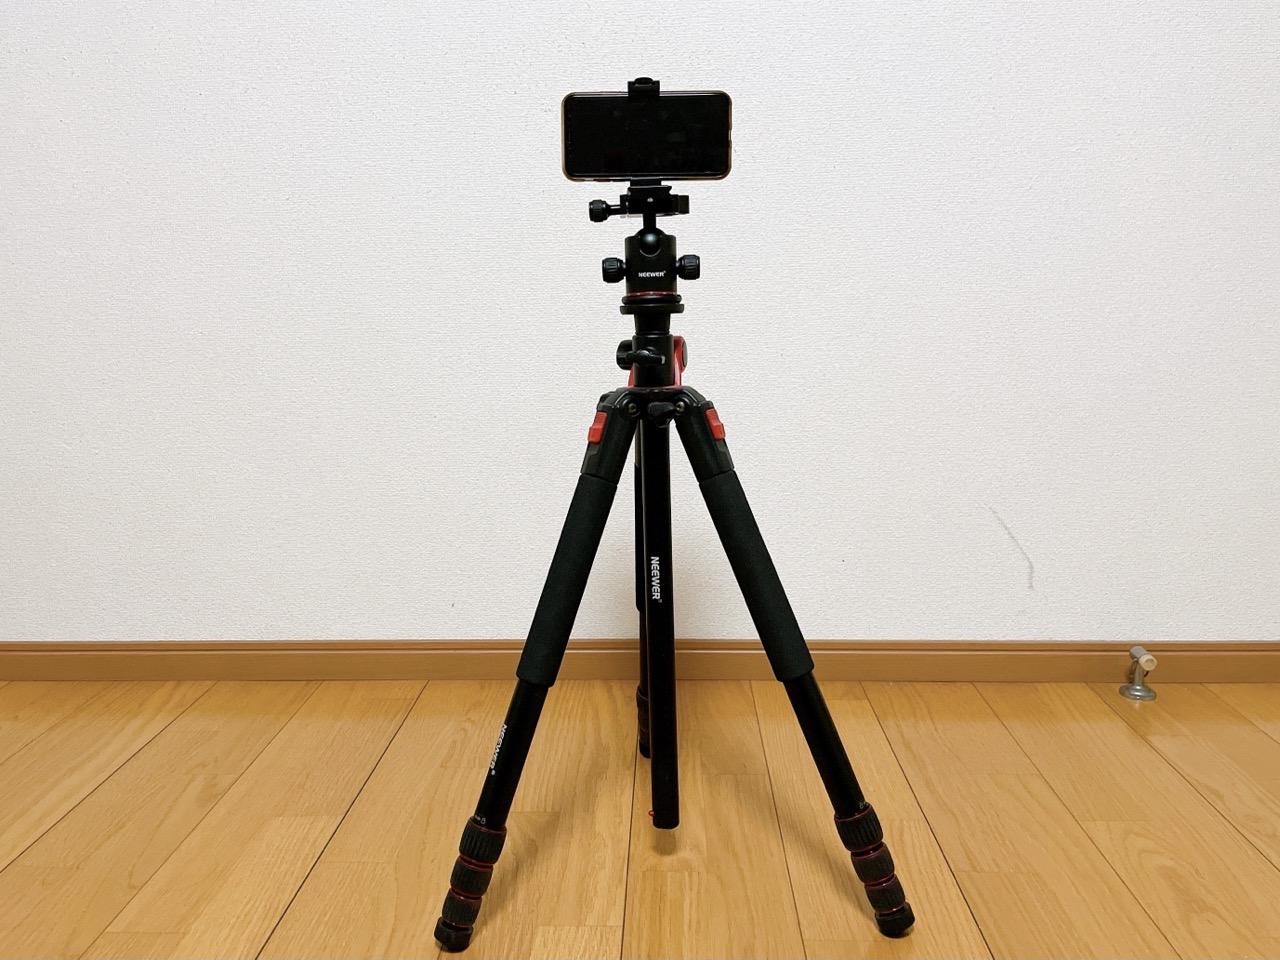 Neewerカメラ三脚をスマホ撮影用にしてみた